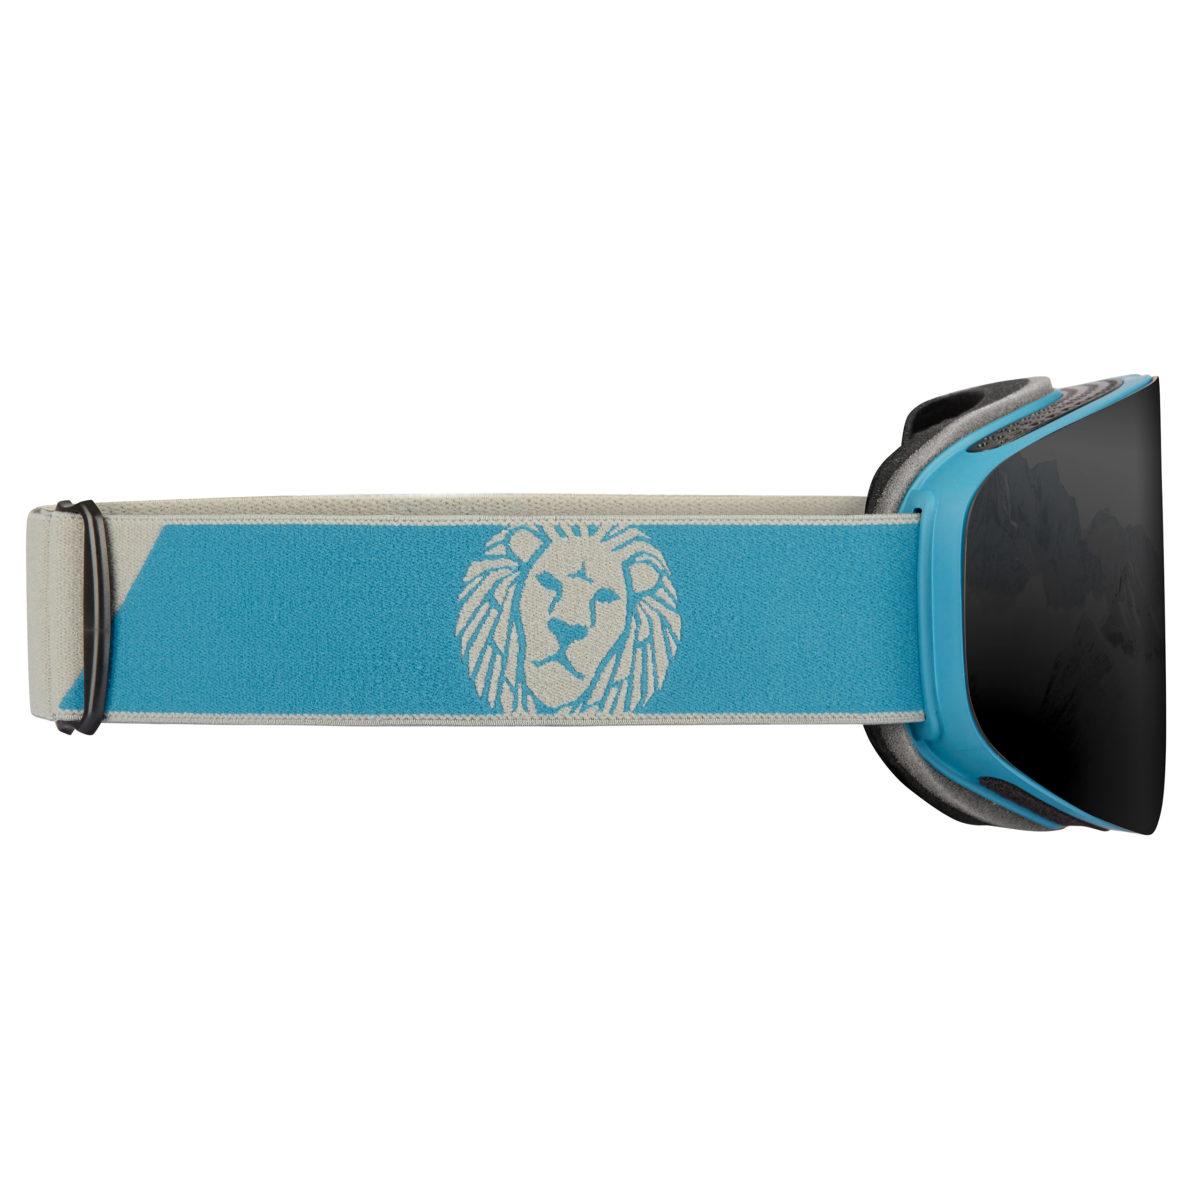 DELAYON Eyewear CORE 2.0 Navy Gray STRONG Black Side